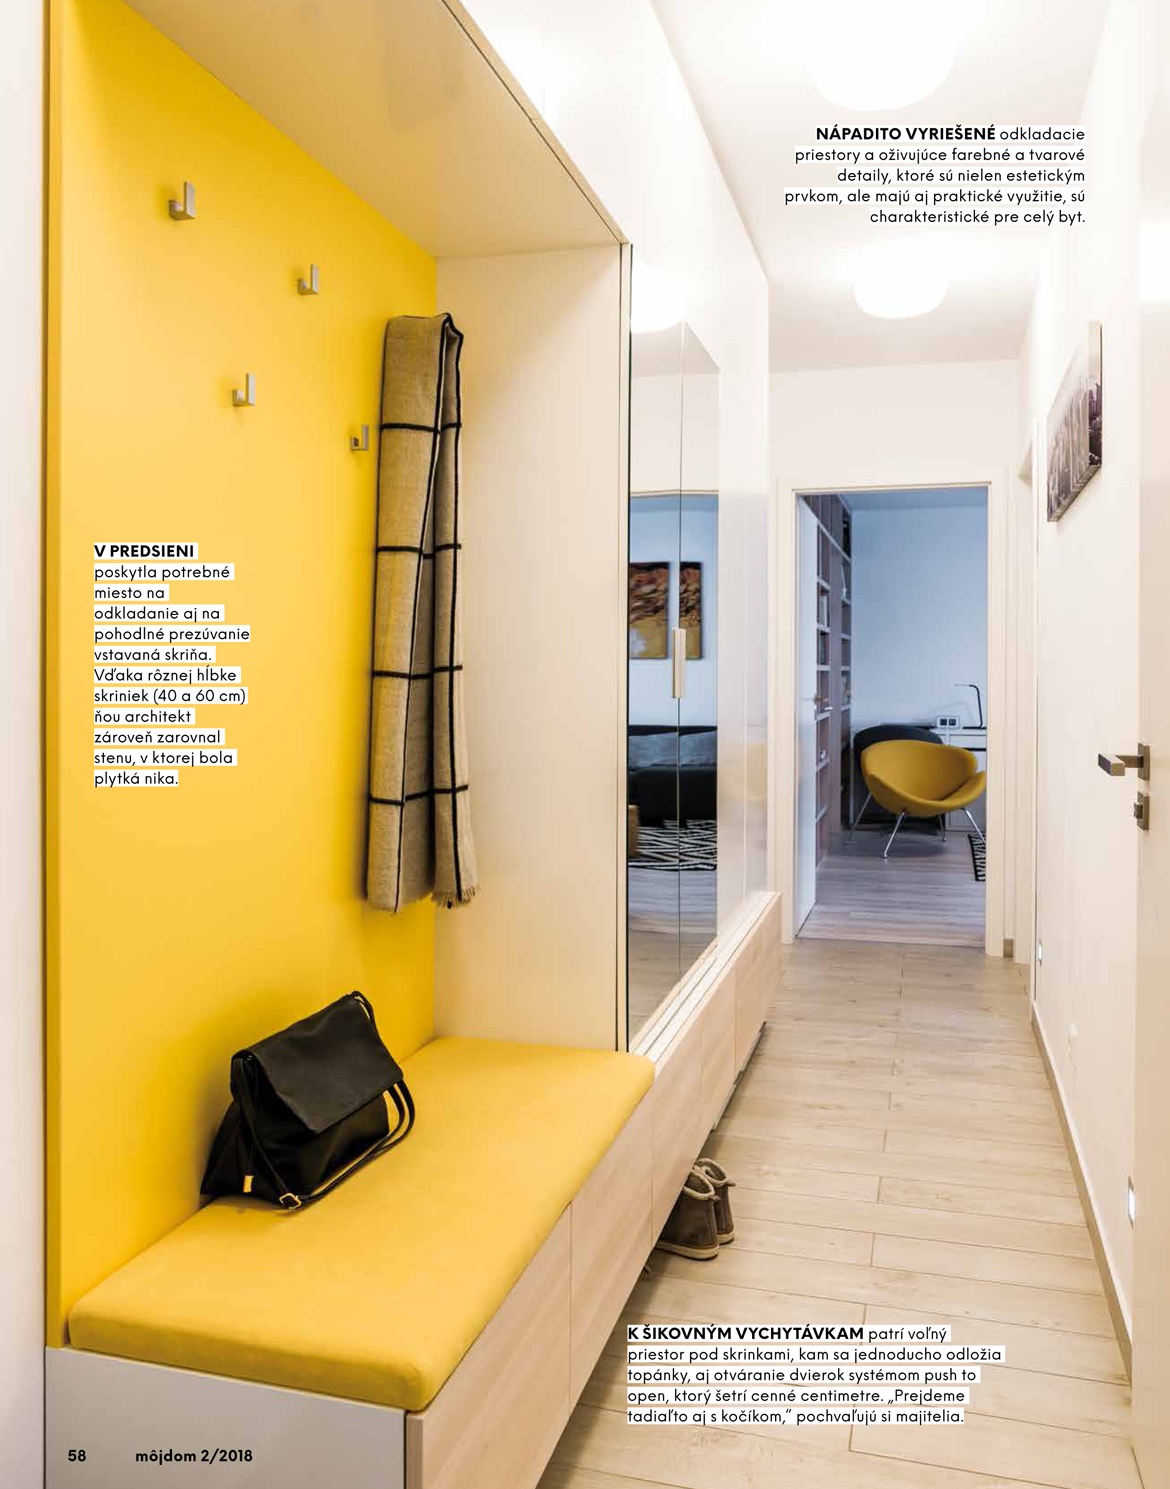 003-byt-cachtice-rekonstrukcia-interier-mojdom-pavlech-architekti